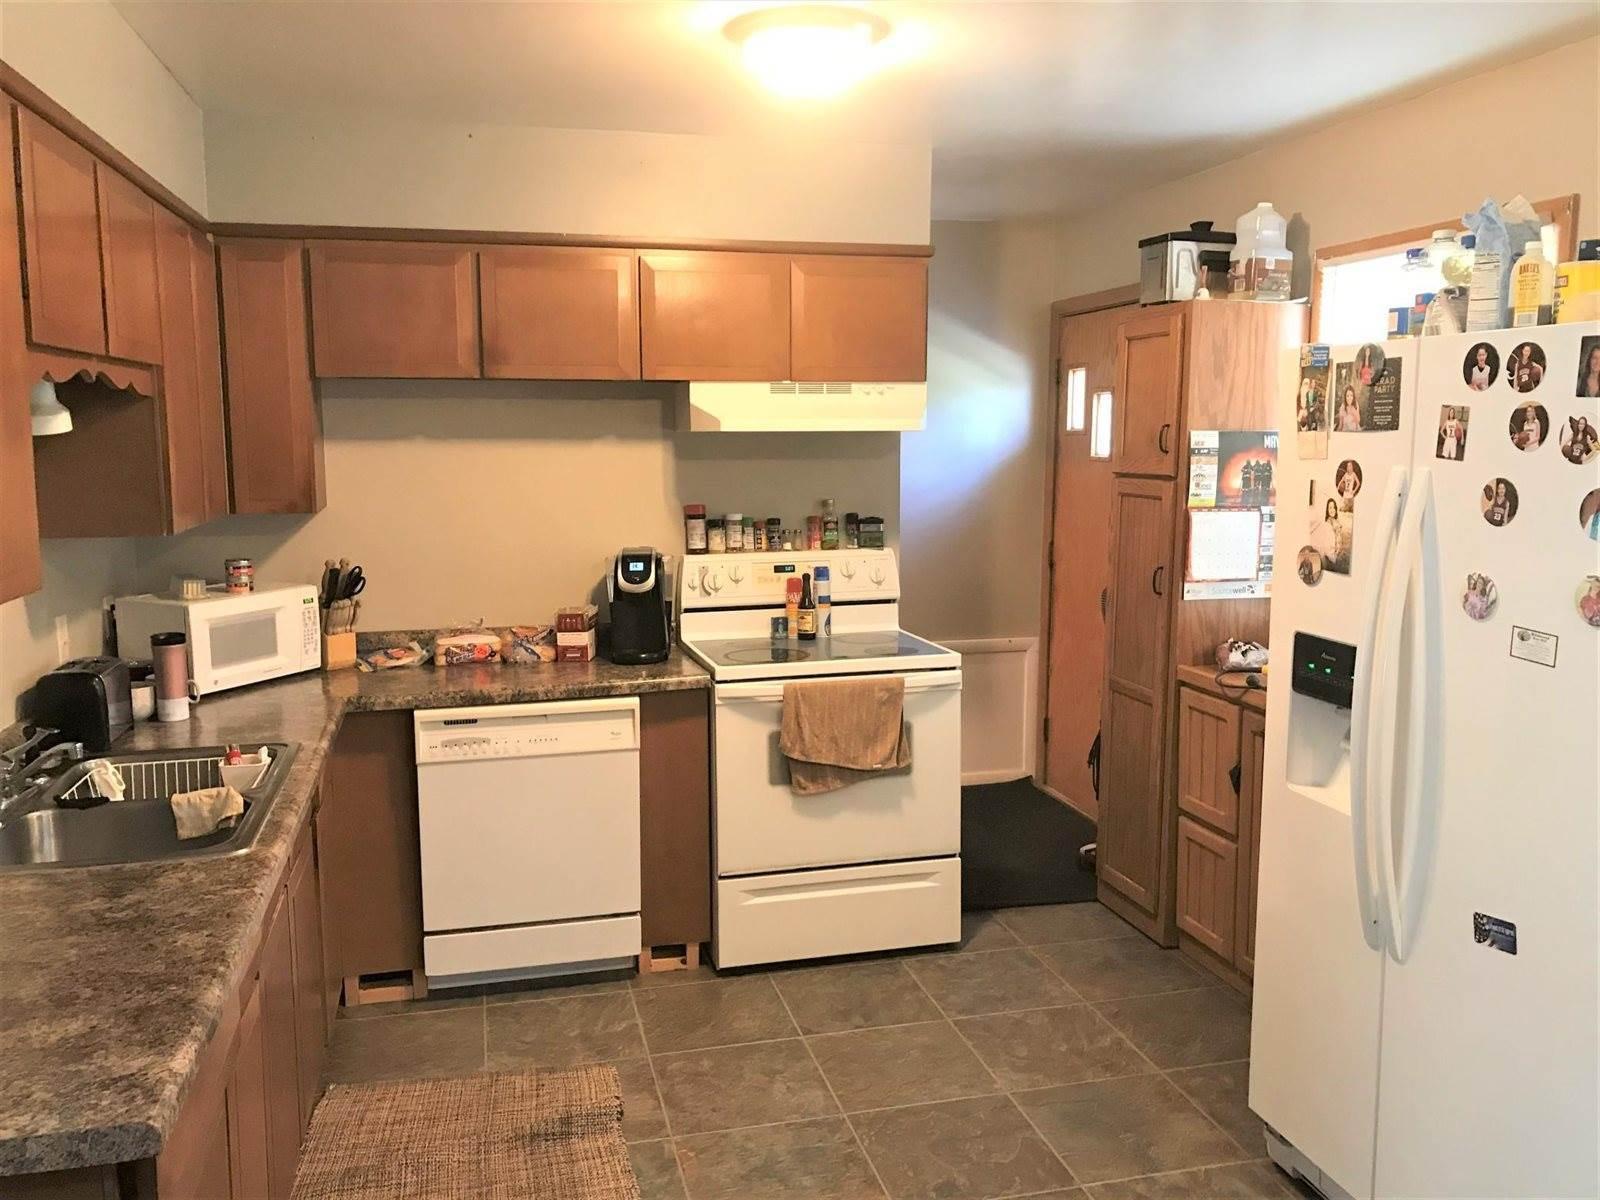 902 8th Street NE, Staples, MN 56479